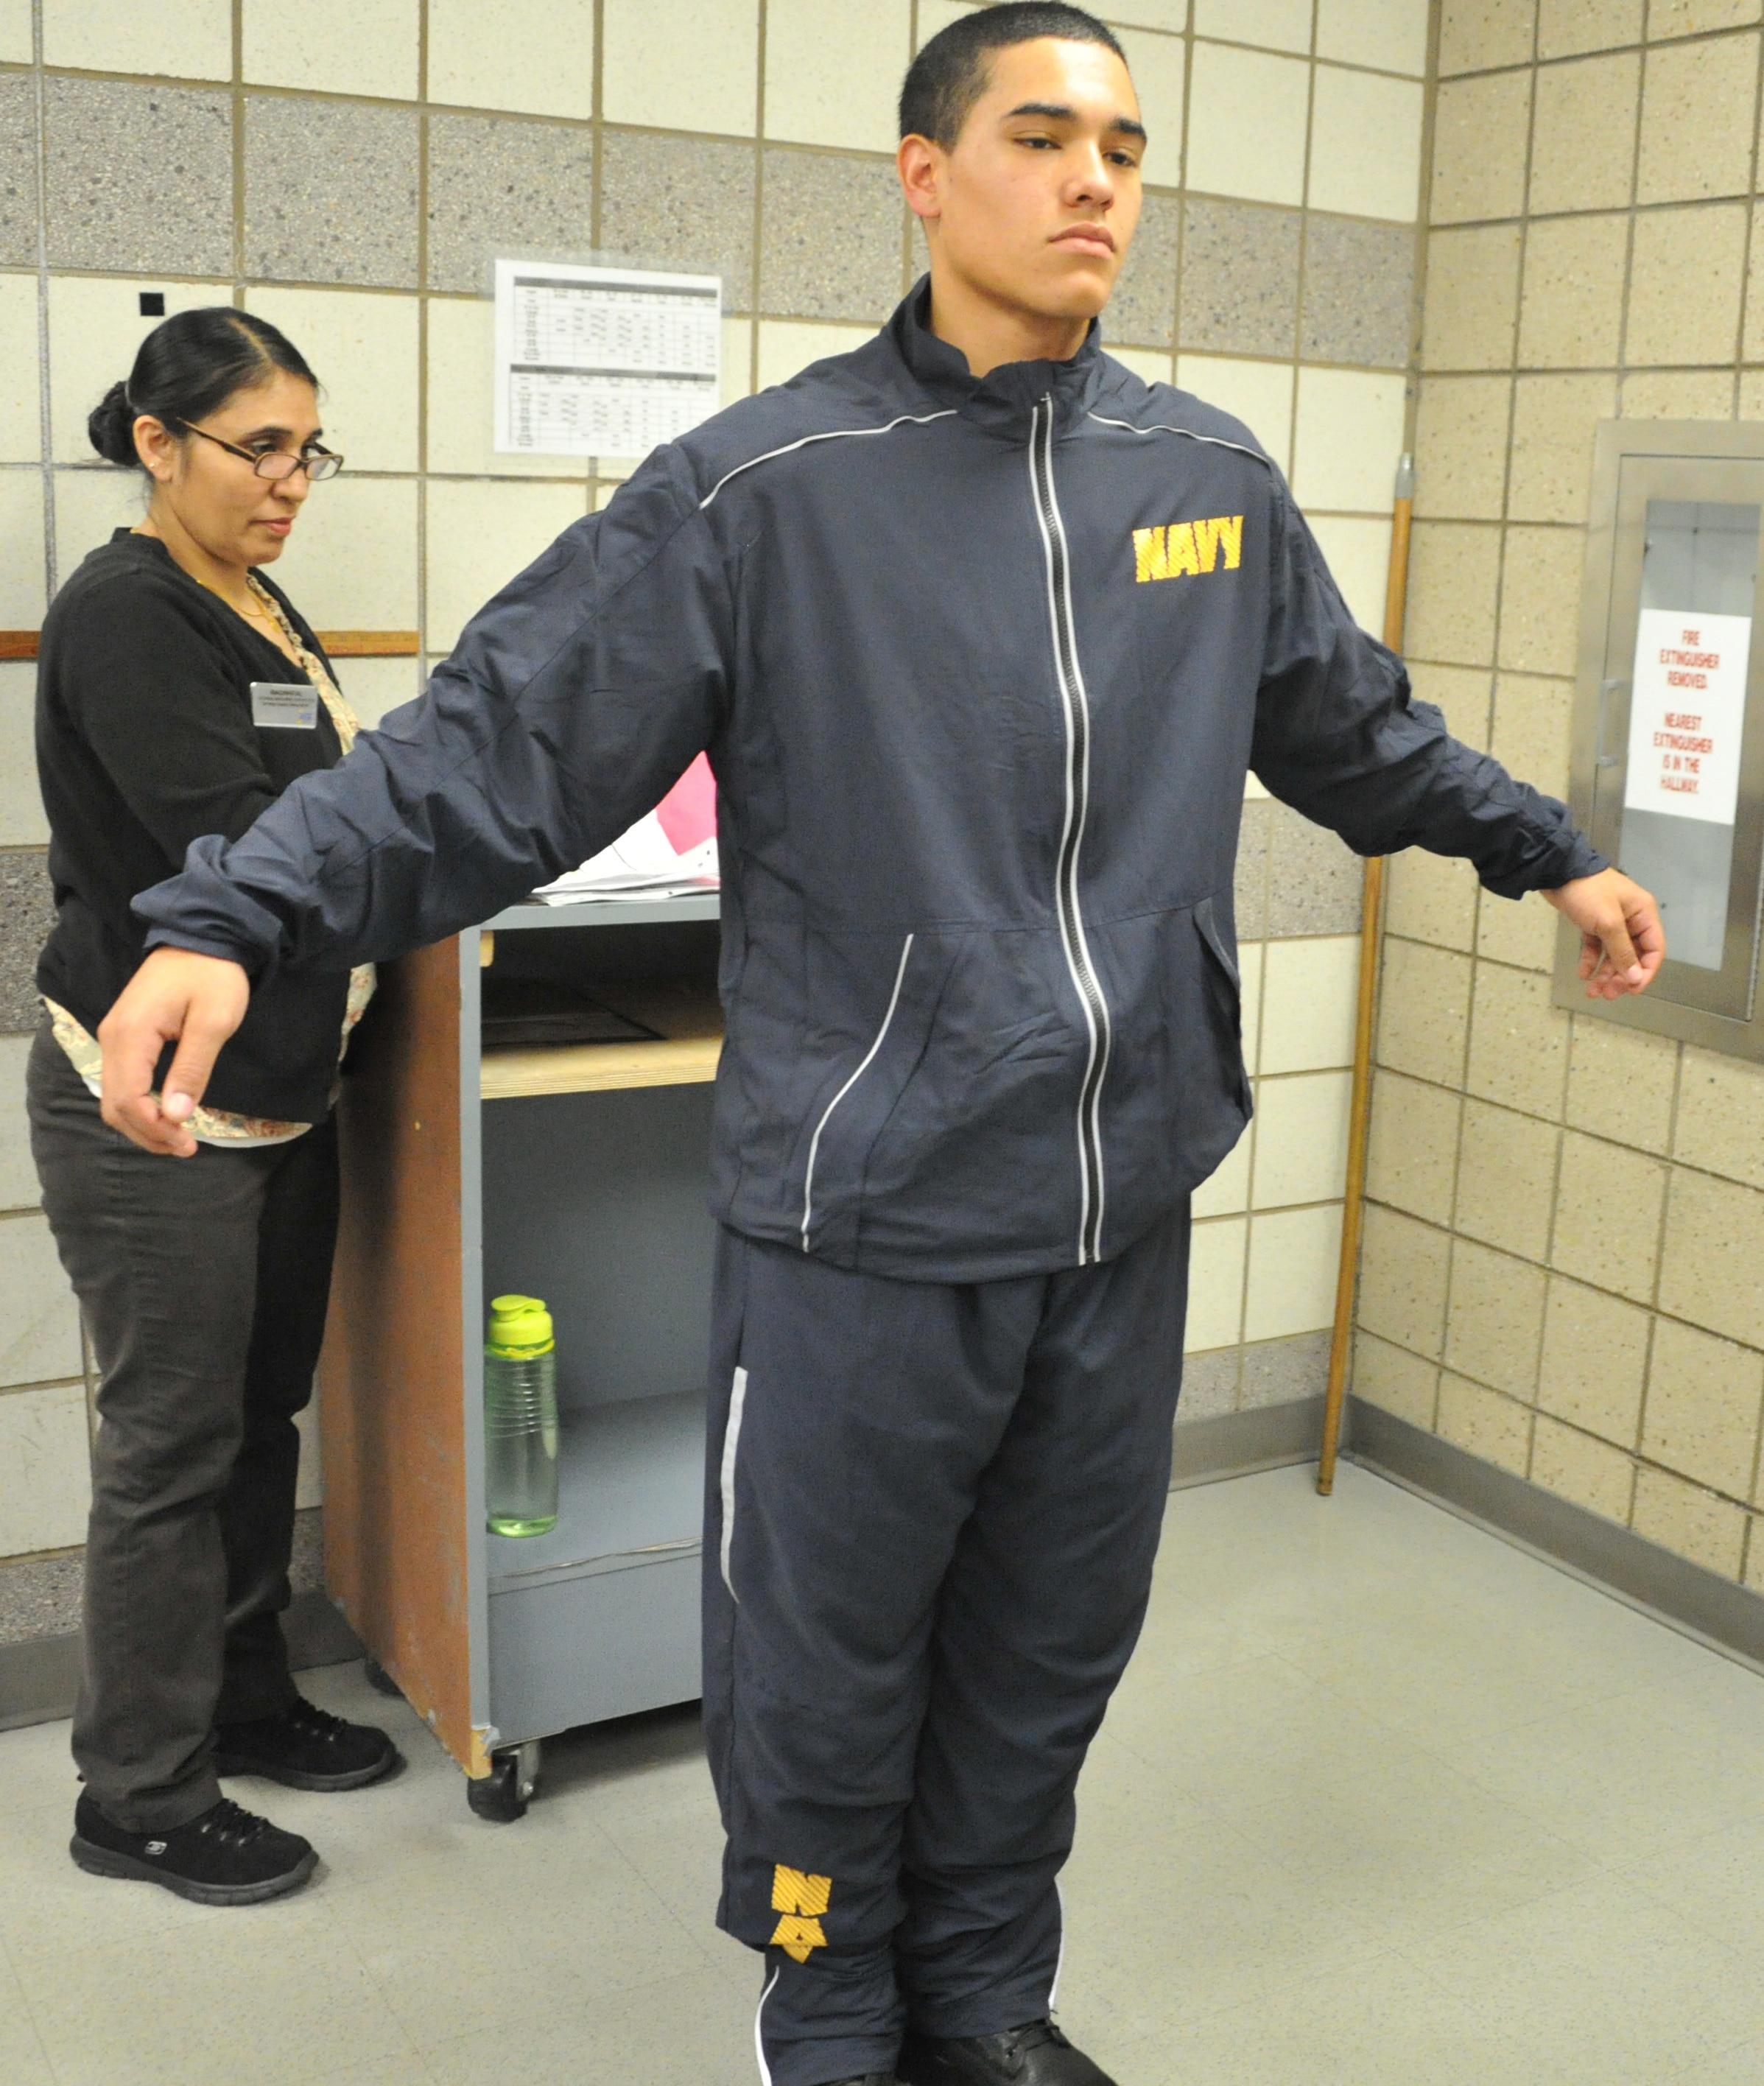 Navy Fitness Suit 3